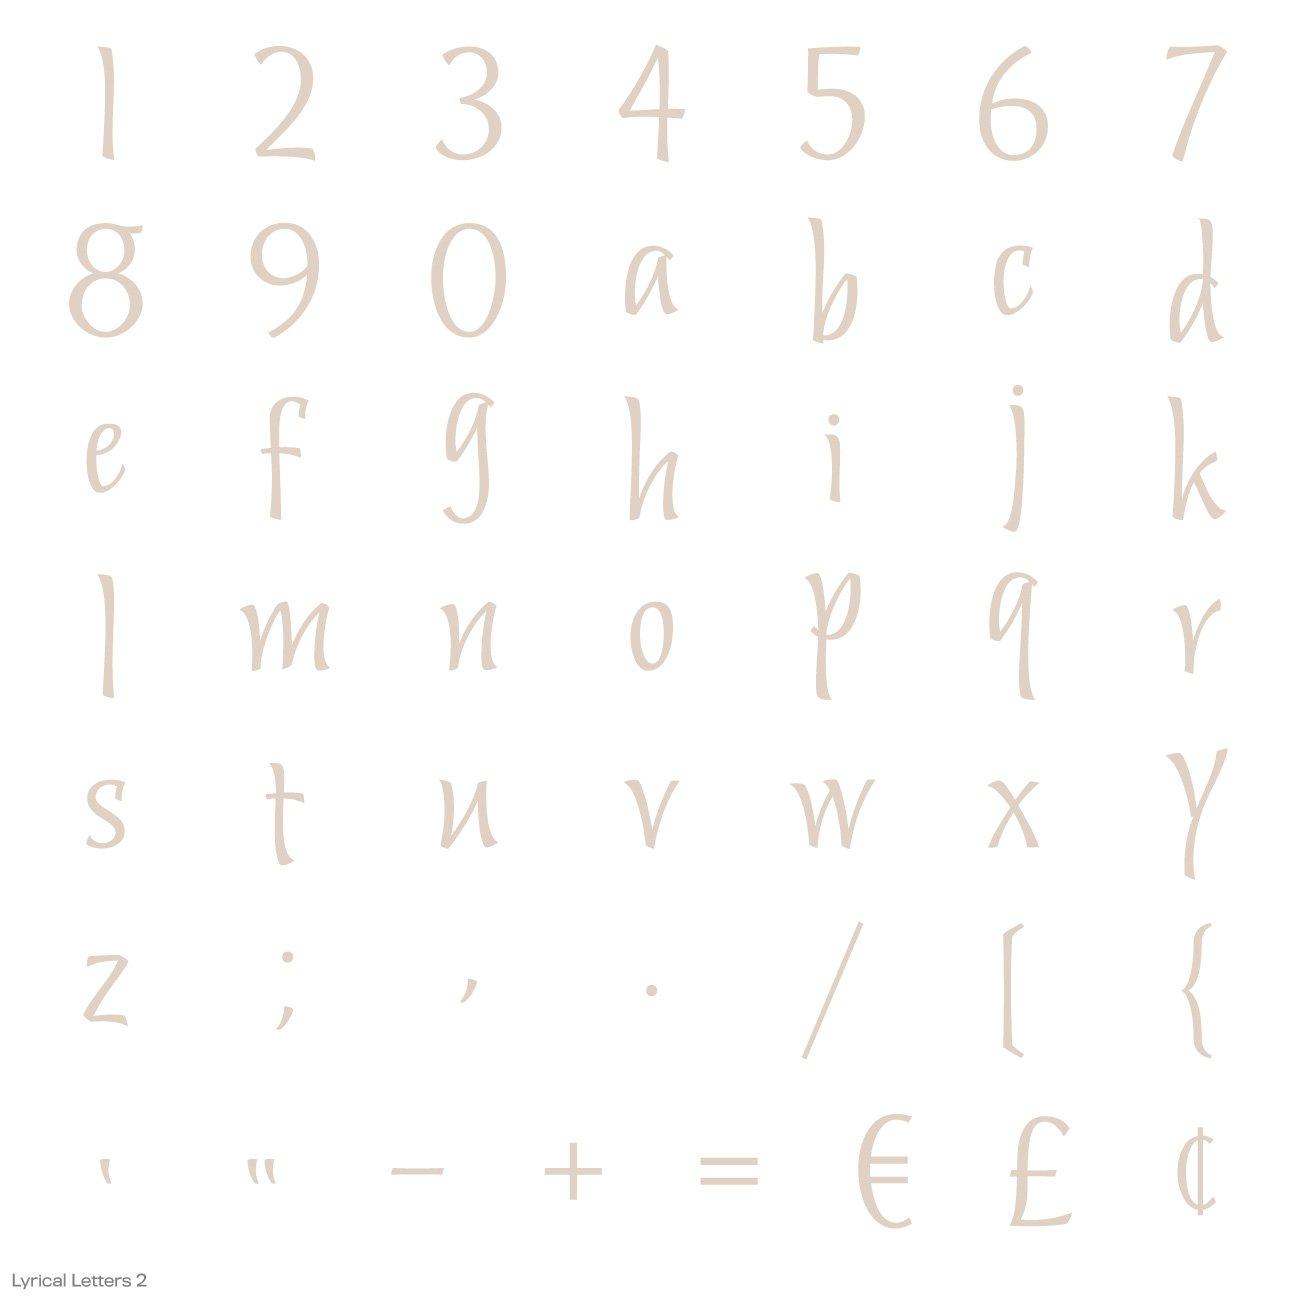 Cricut Lyrical Letters 2 Cartridge by Cricut (Image #16)